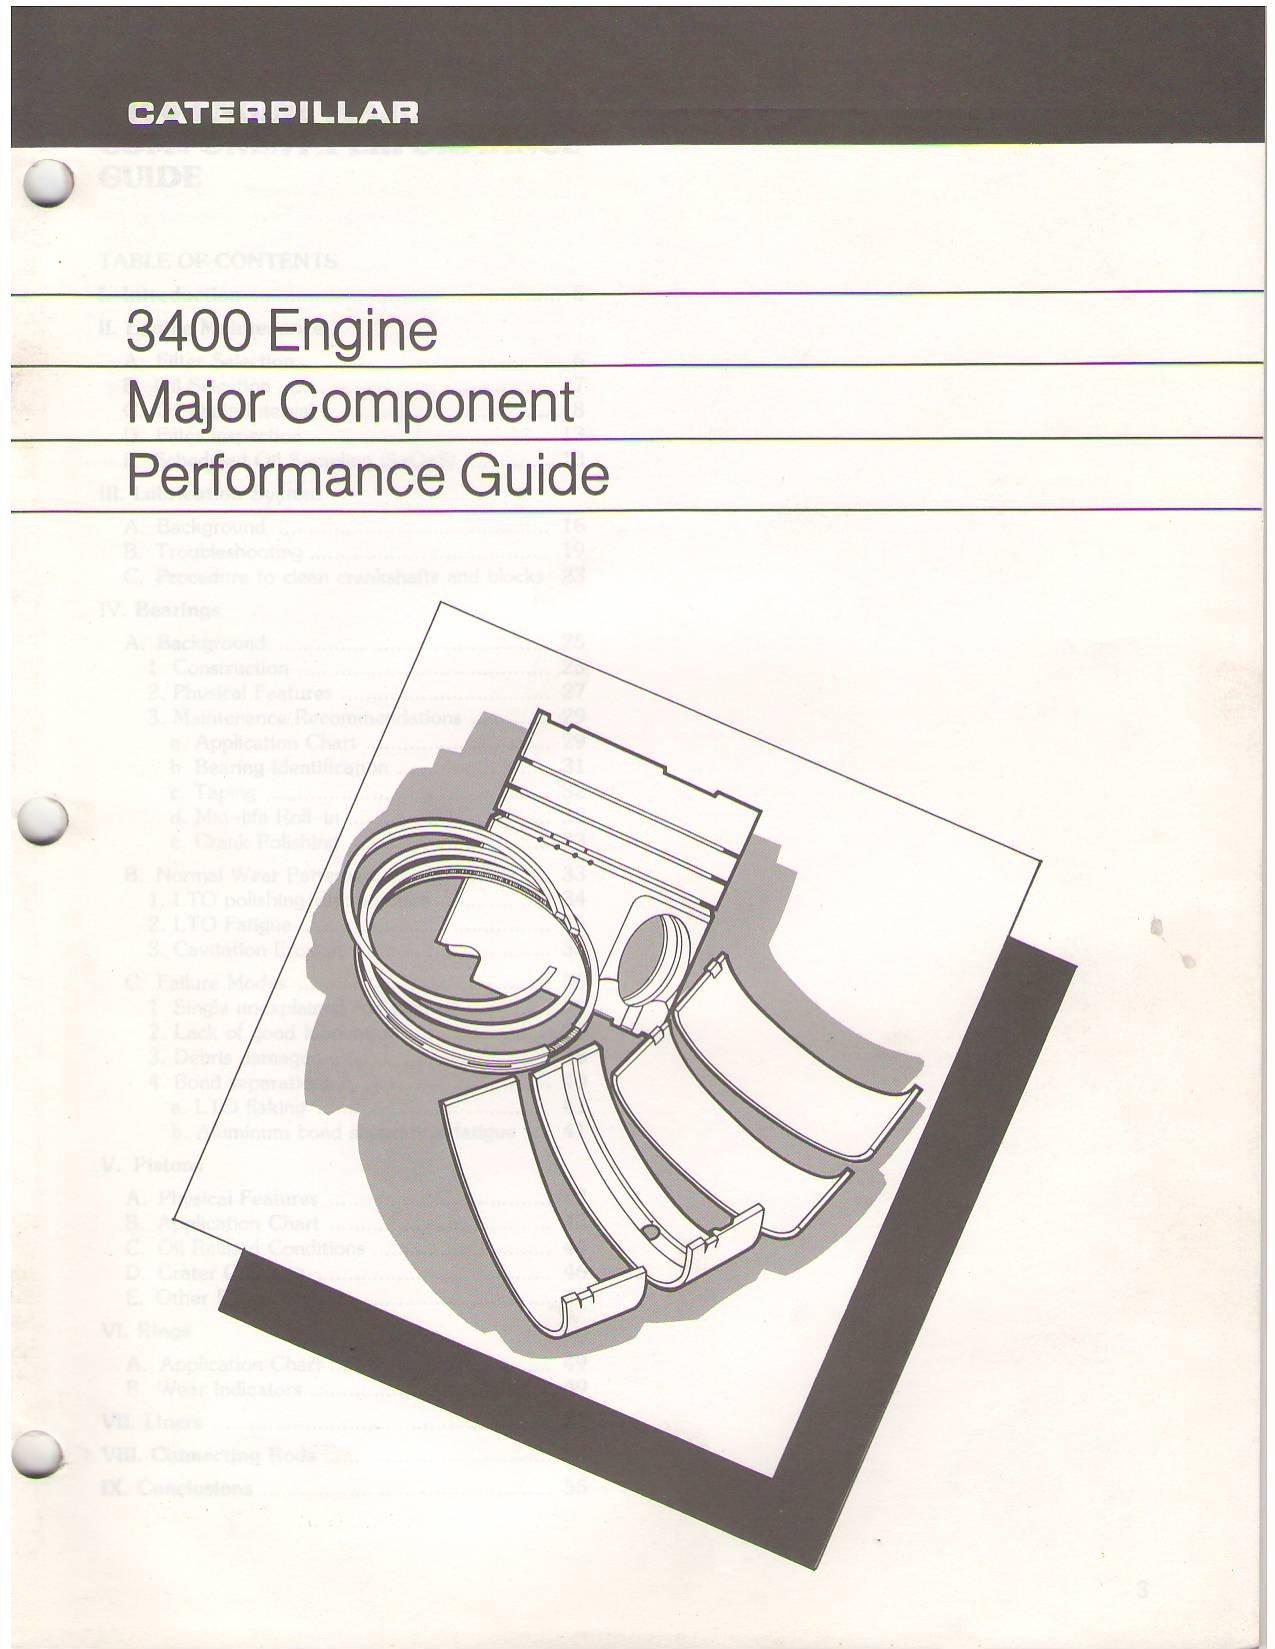 caterpillar 3400 engine major component performance guide rh amazon com